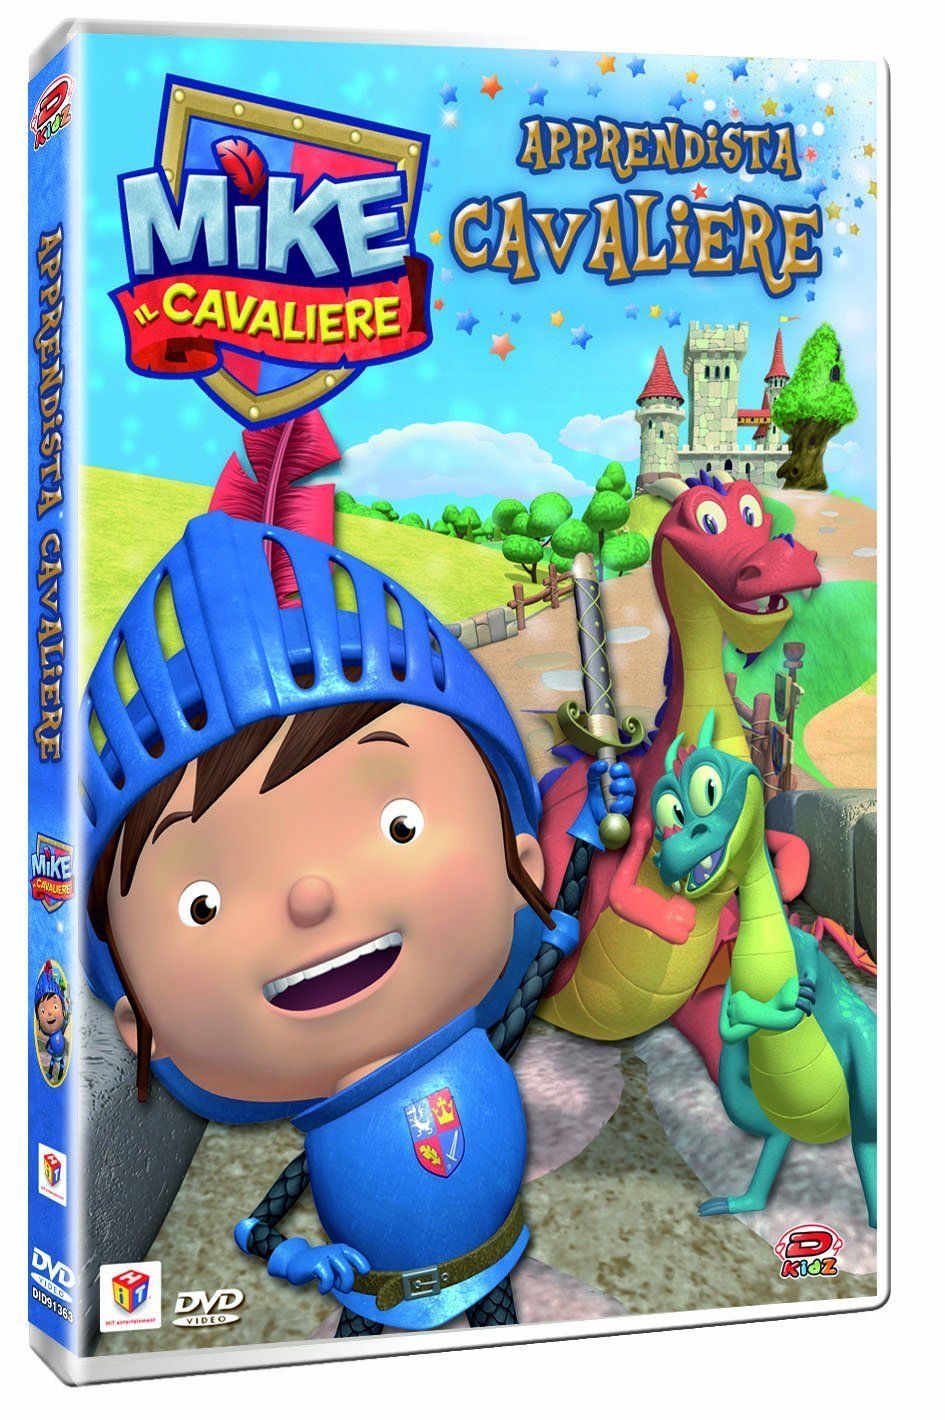 Mike Il Cavaliere Cavaliere, Film